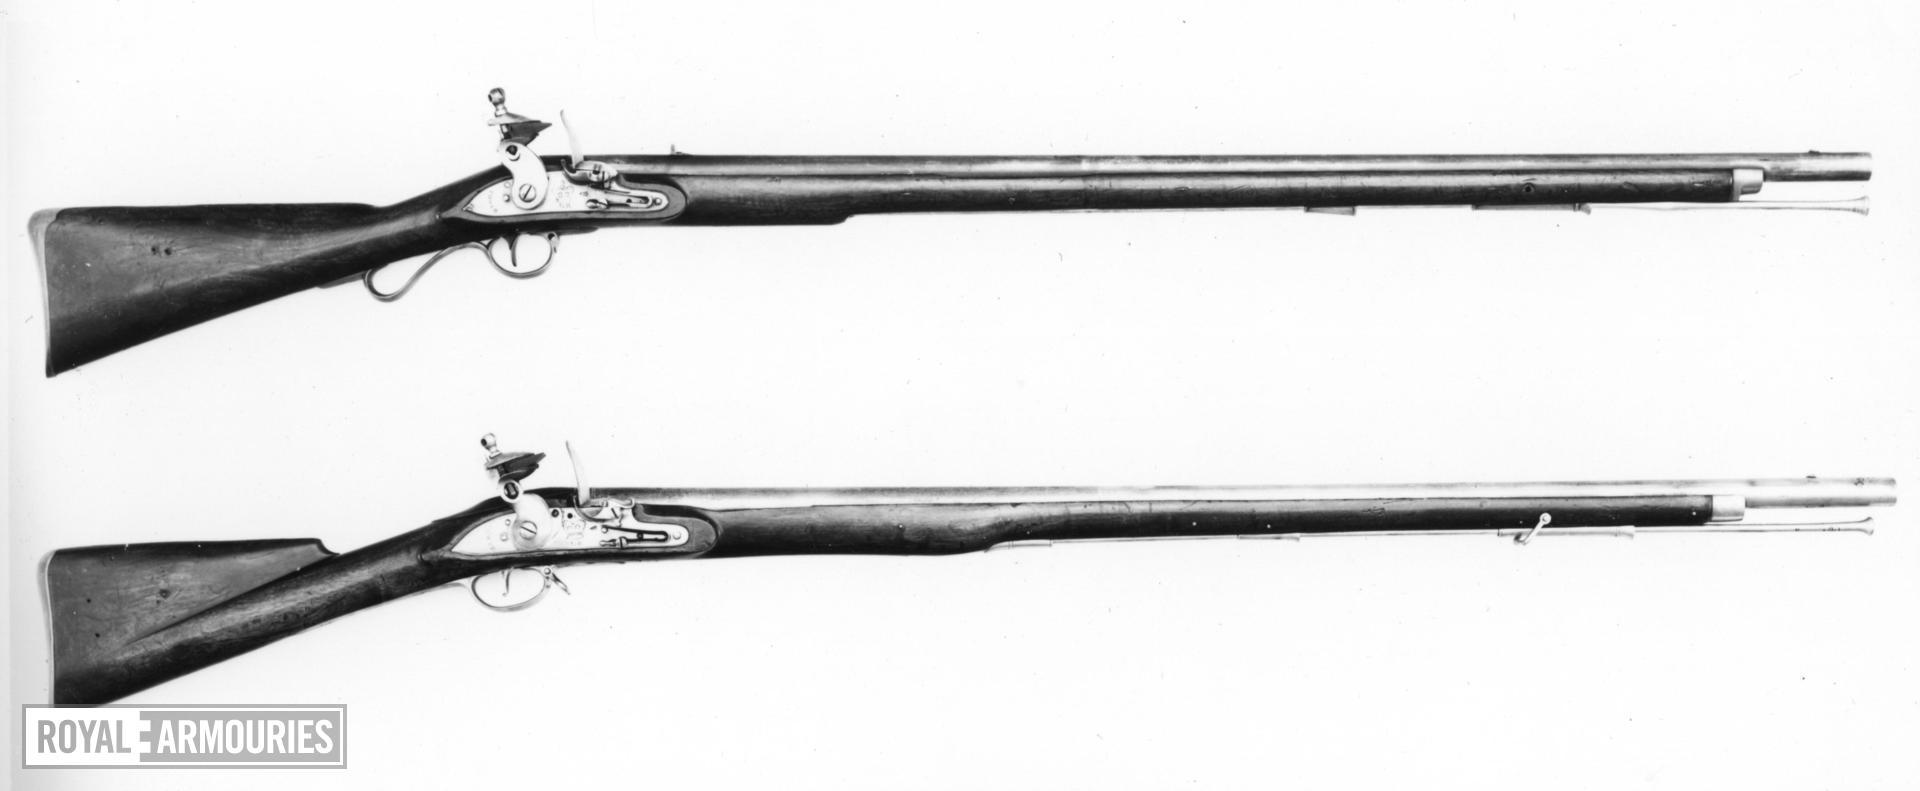 Flintlock muzzle-loading military musket - New Land Light Infantry Pattern